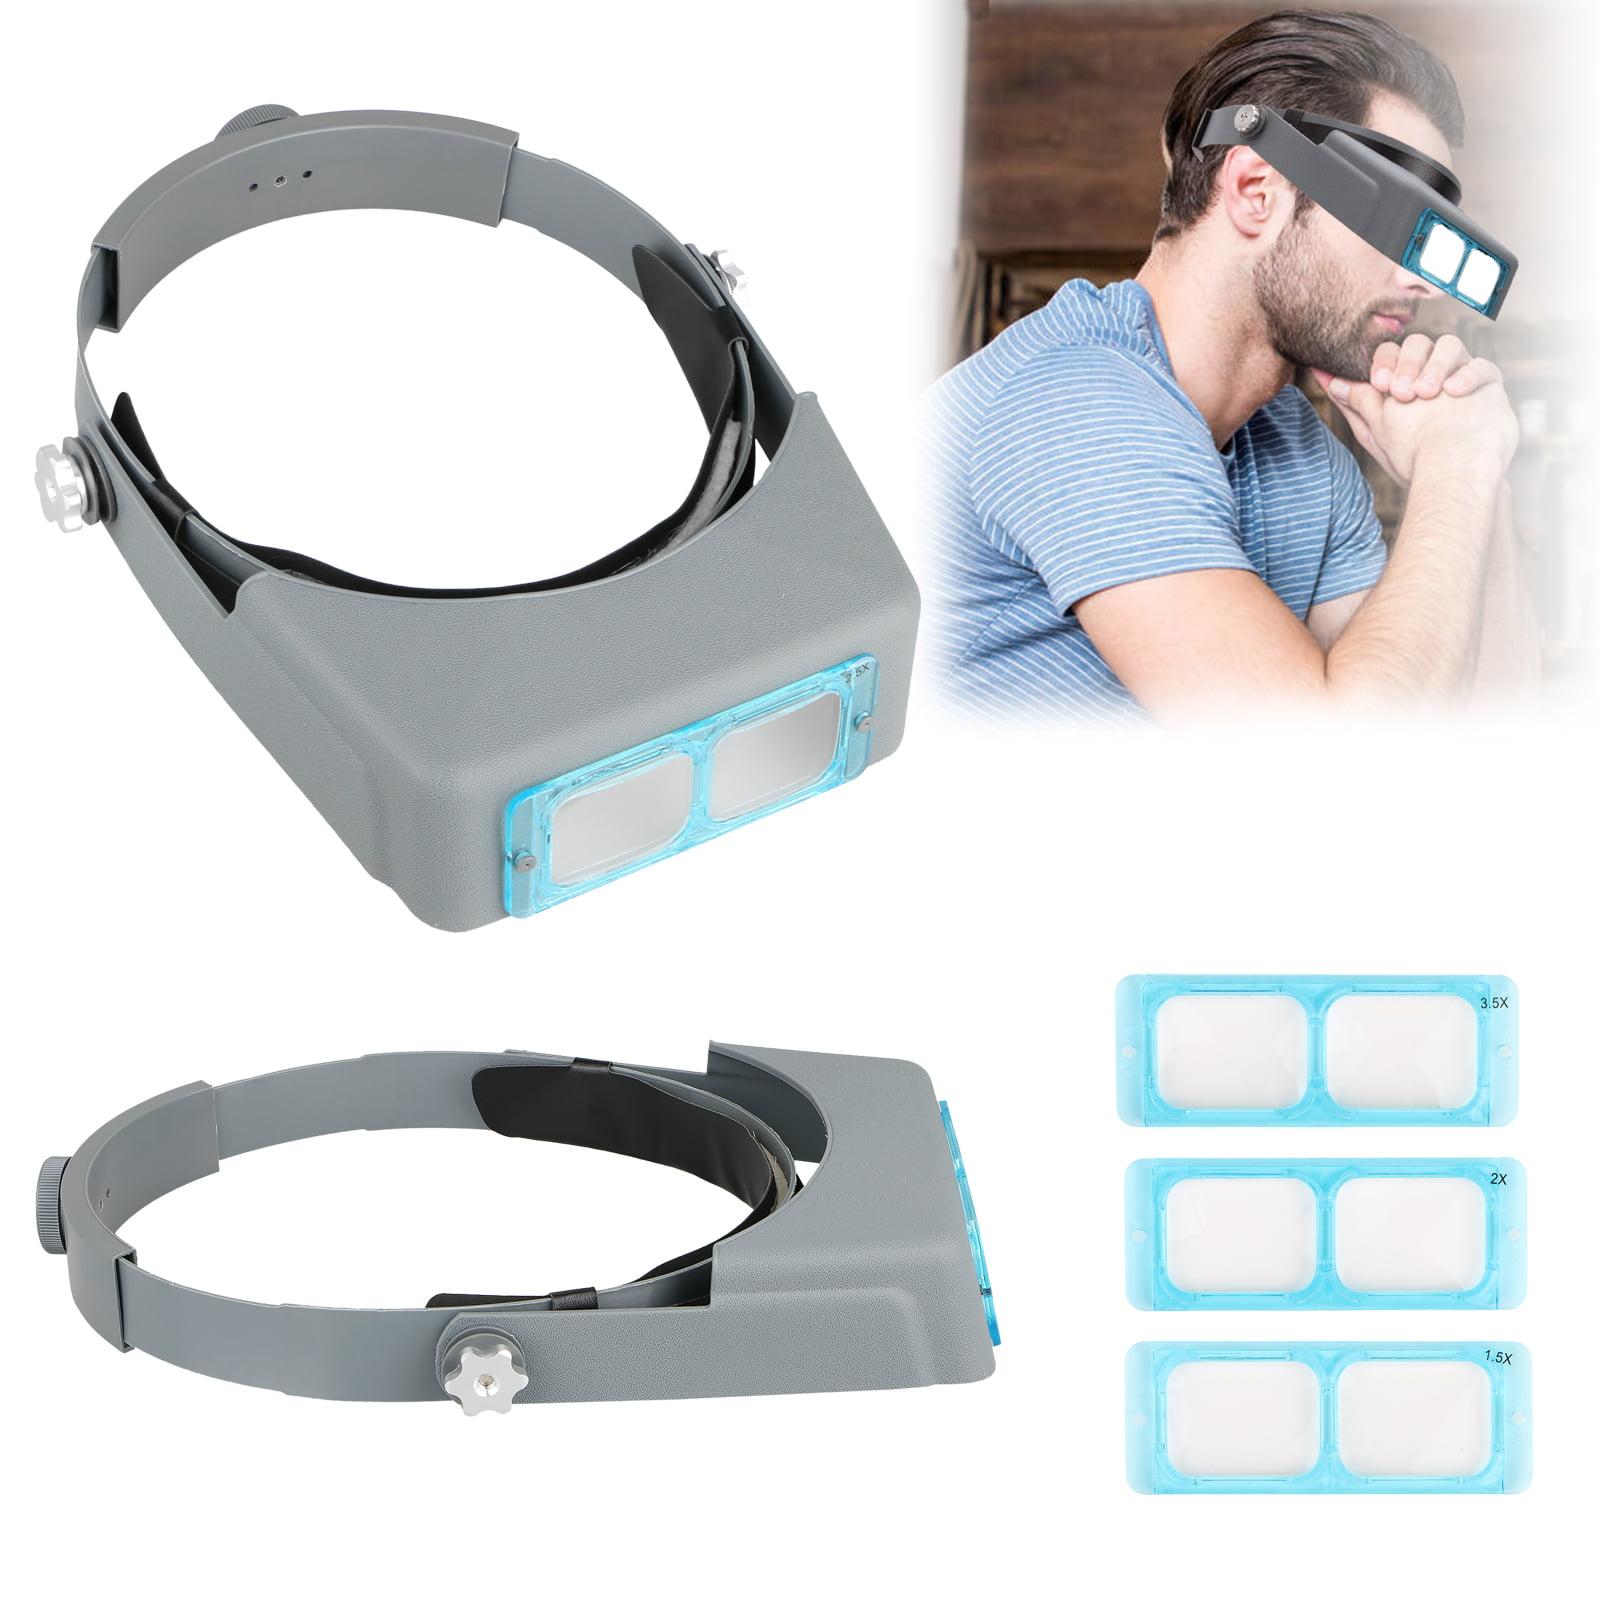 "Headband Magnifier Jewelry Visor Glass Opitcal Binocular Magnifier w/ Lens, 4"" Focal Length 1.5X 2X 2.5X 3.5x Magnification"